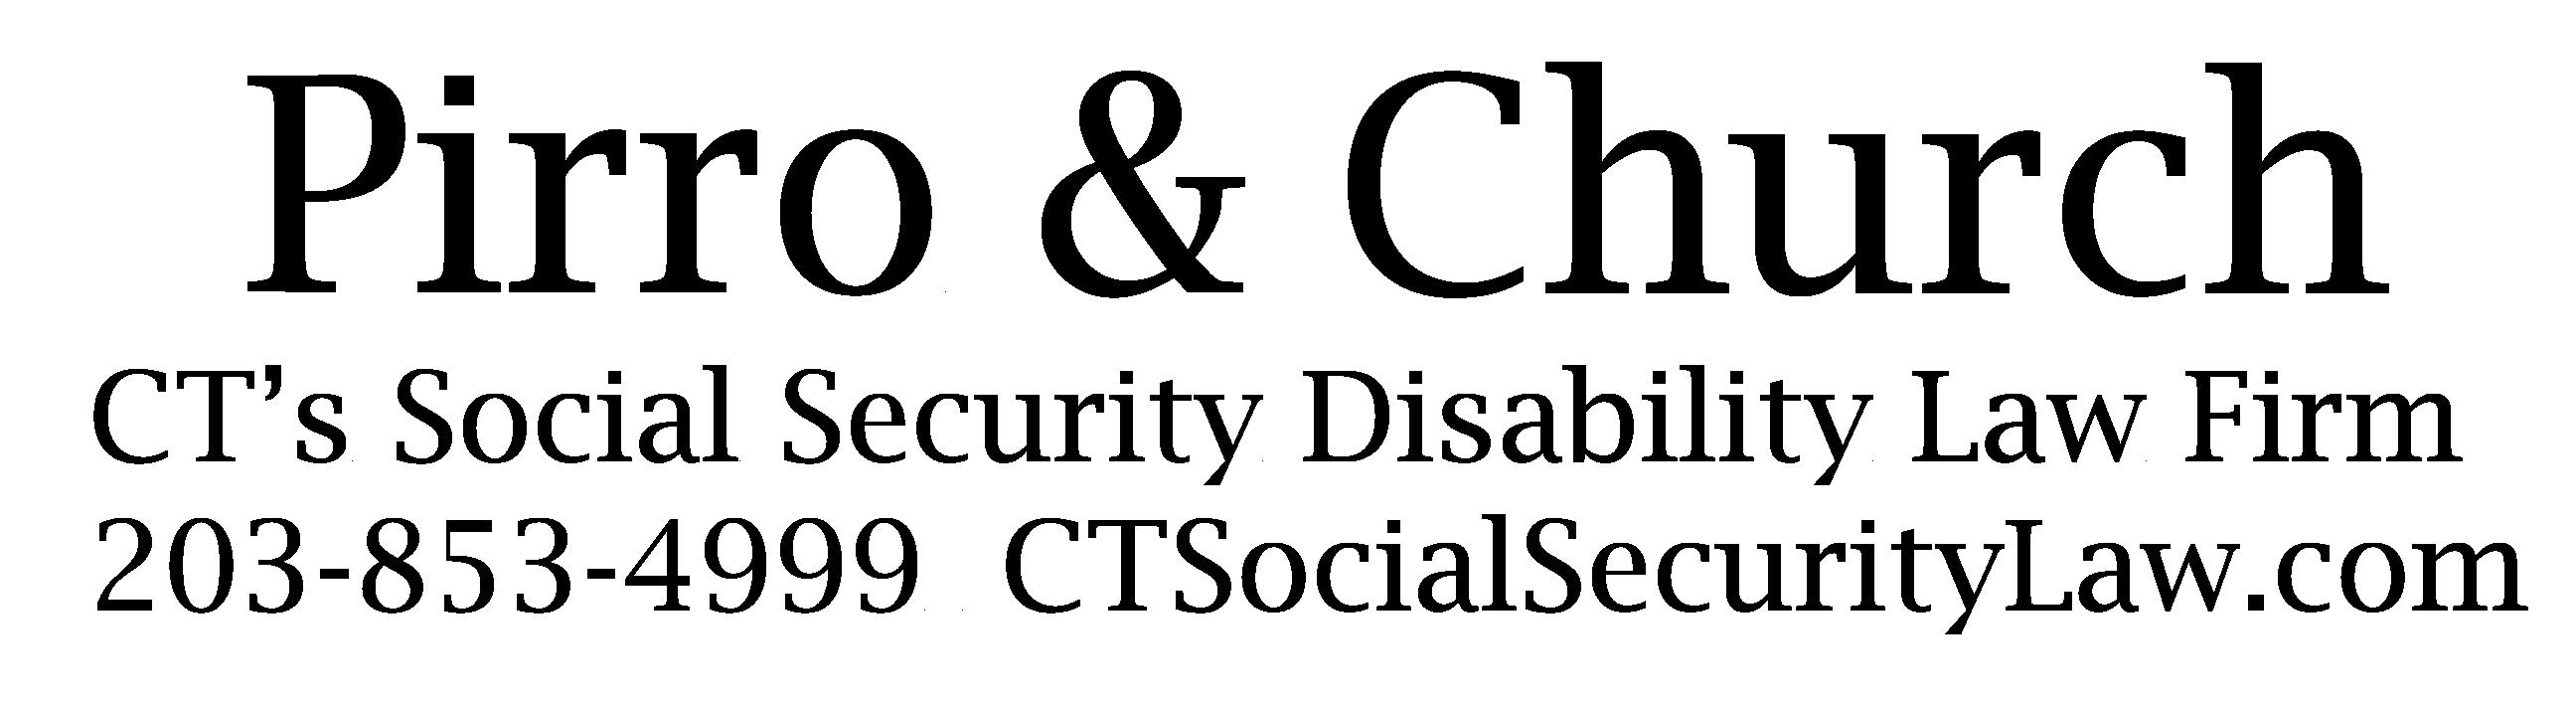 611a6d20c110b.png